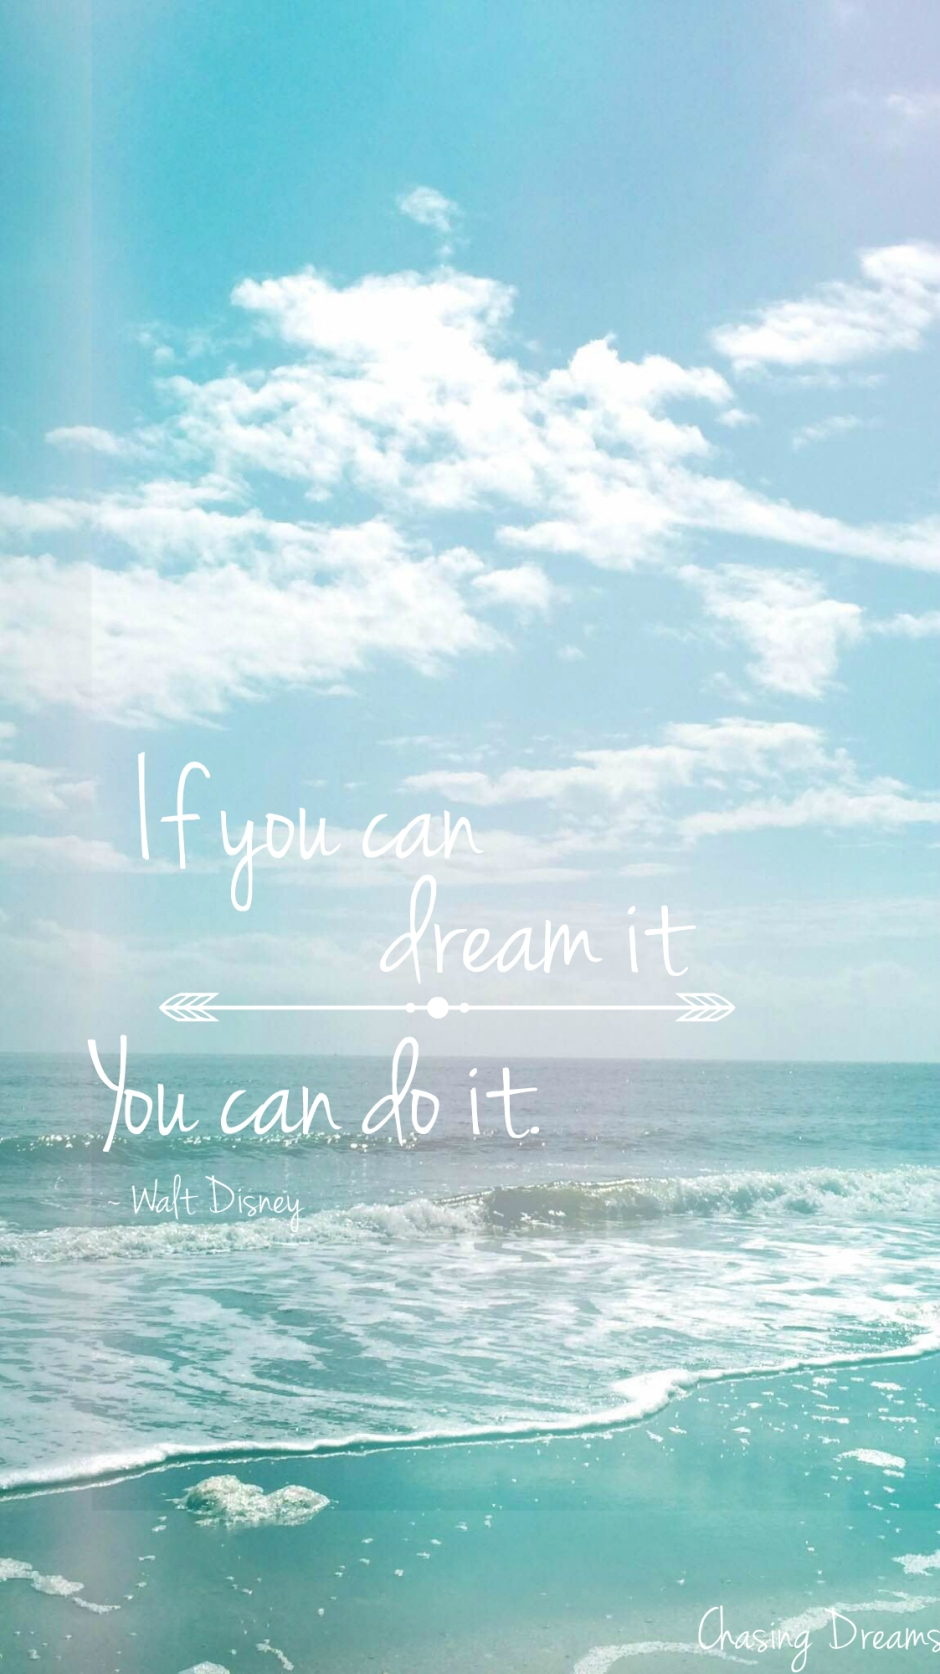 Chasing Dreams, Walt Disney, Dreams, Dreaming, Hope